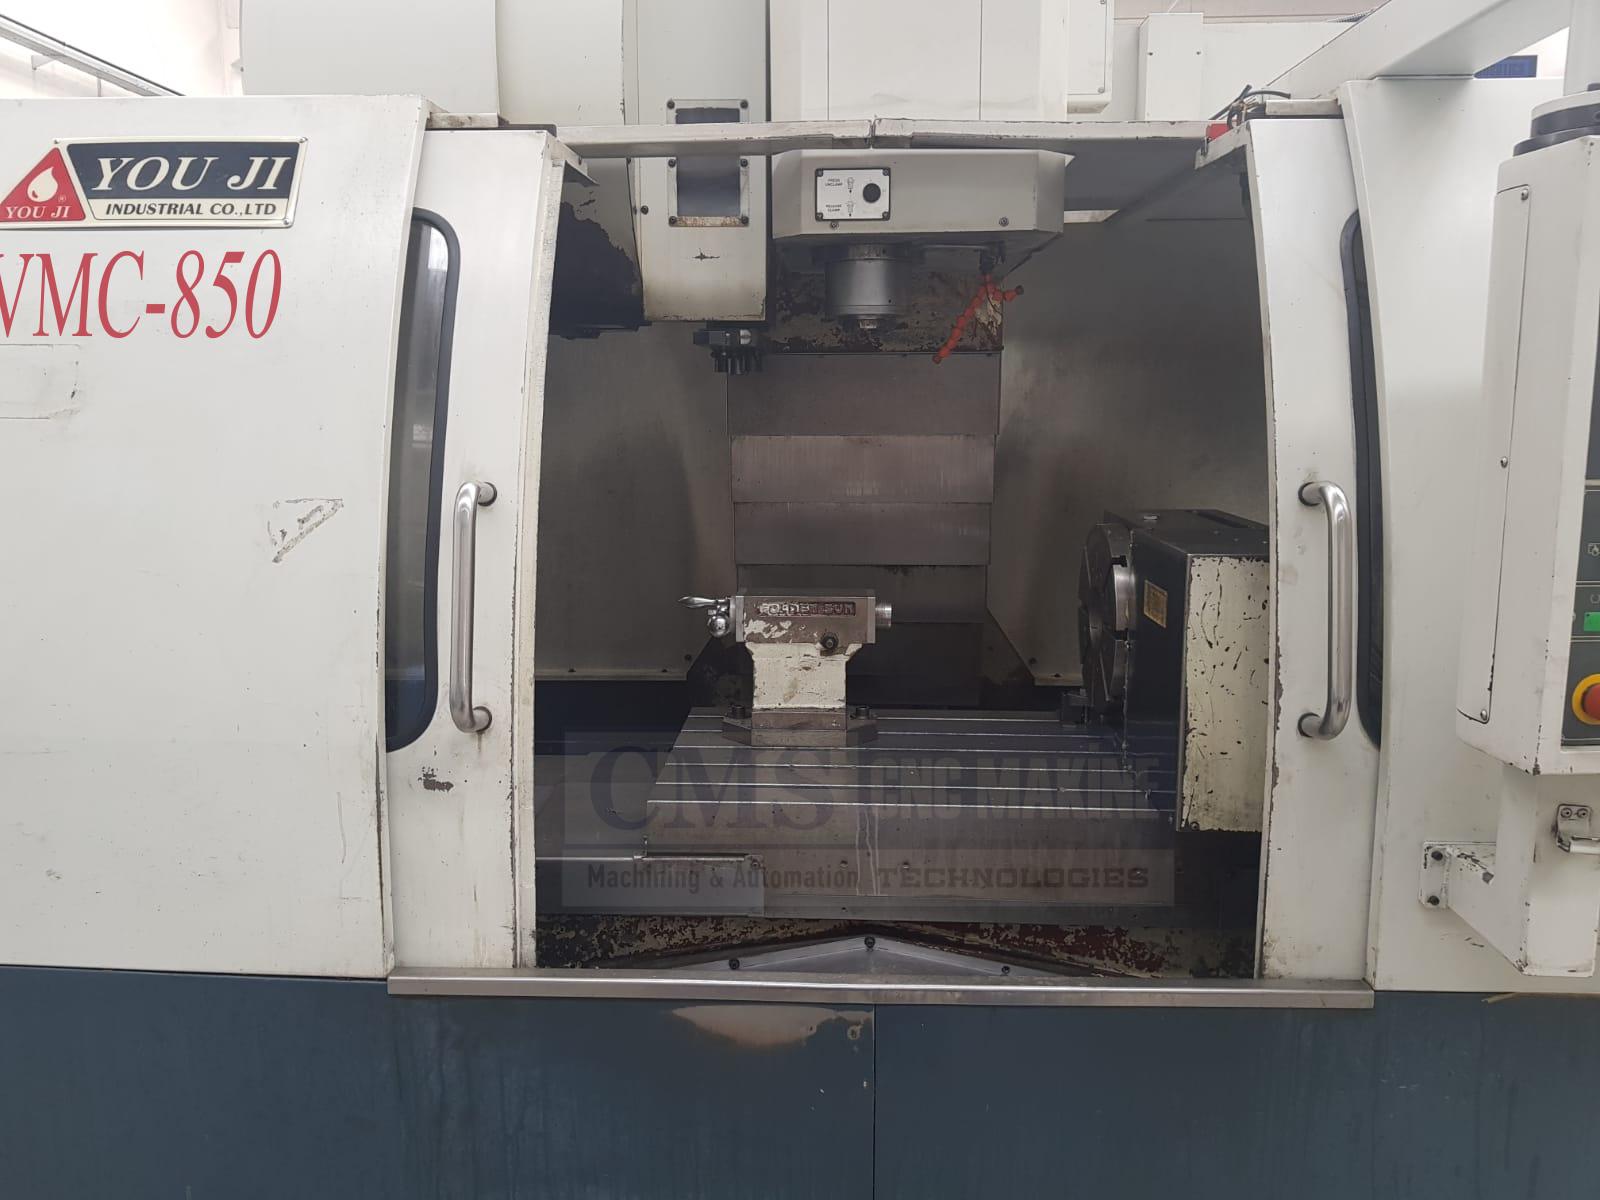 2.El YOUJI VMC 850 Divizörlü Cnc Dik İşleme Merkezi